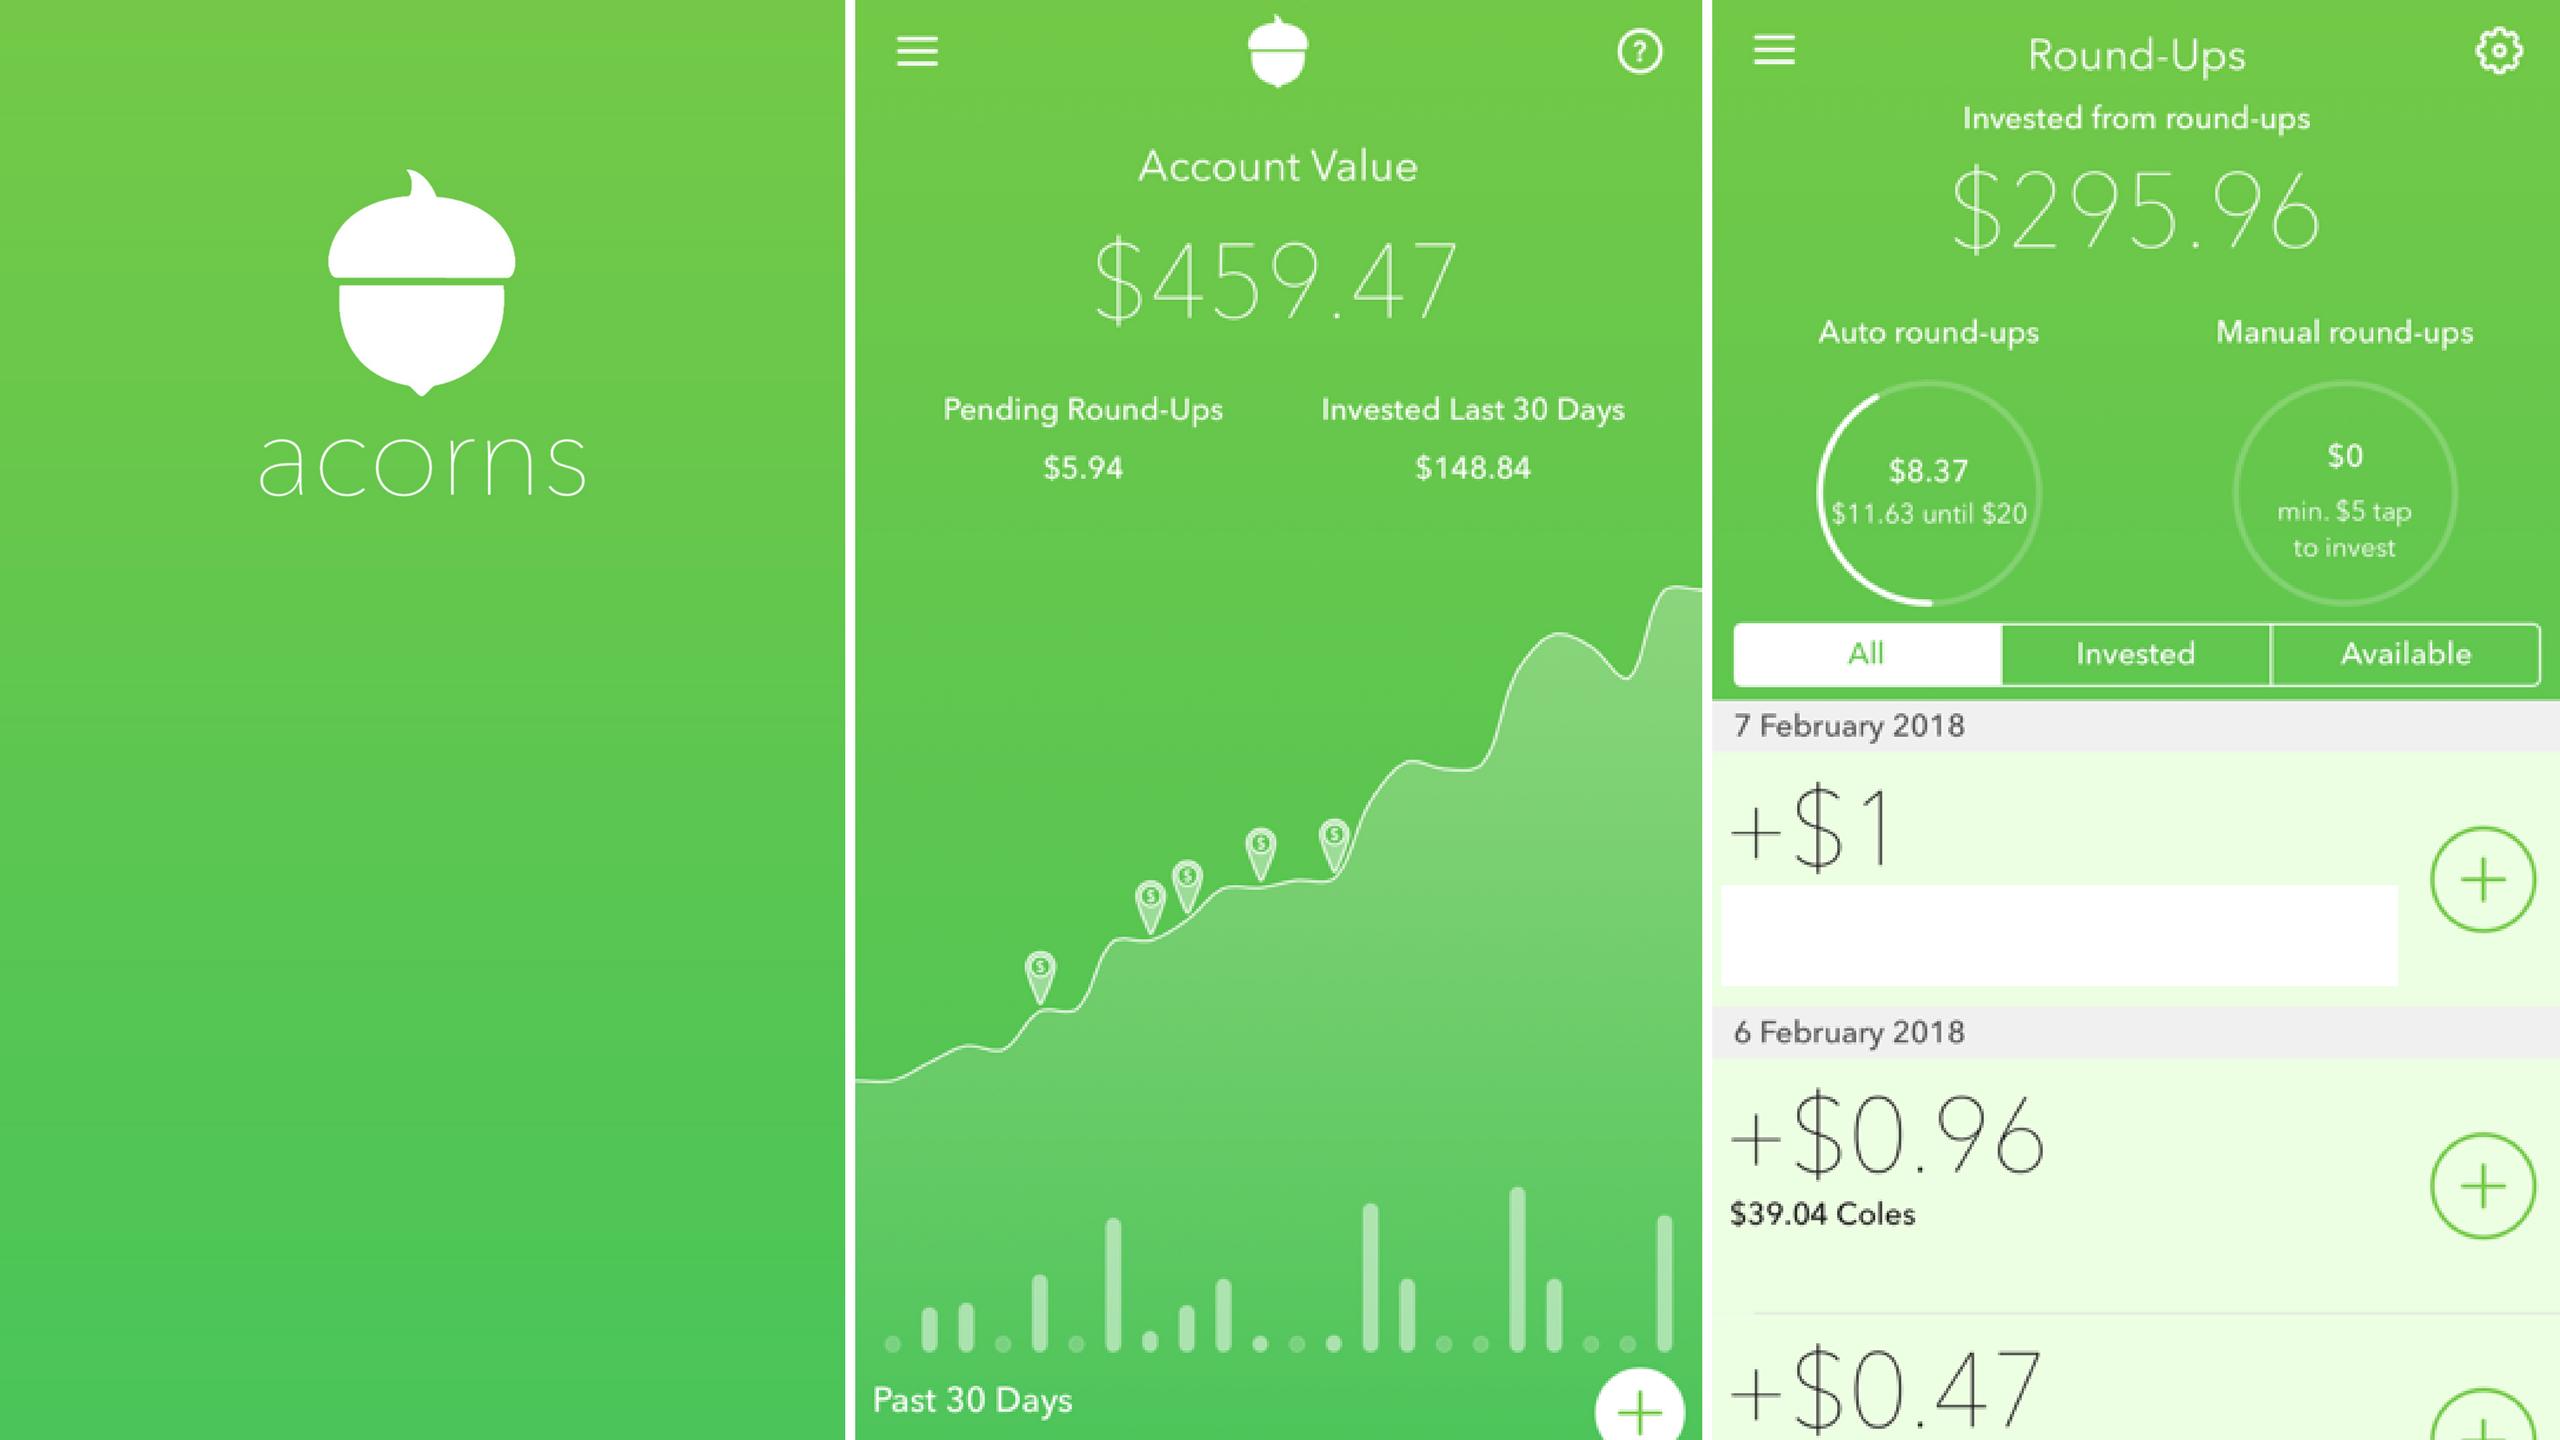 Acorns Investment App Review - Suger Coat It